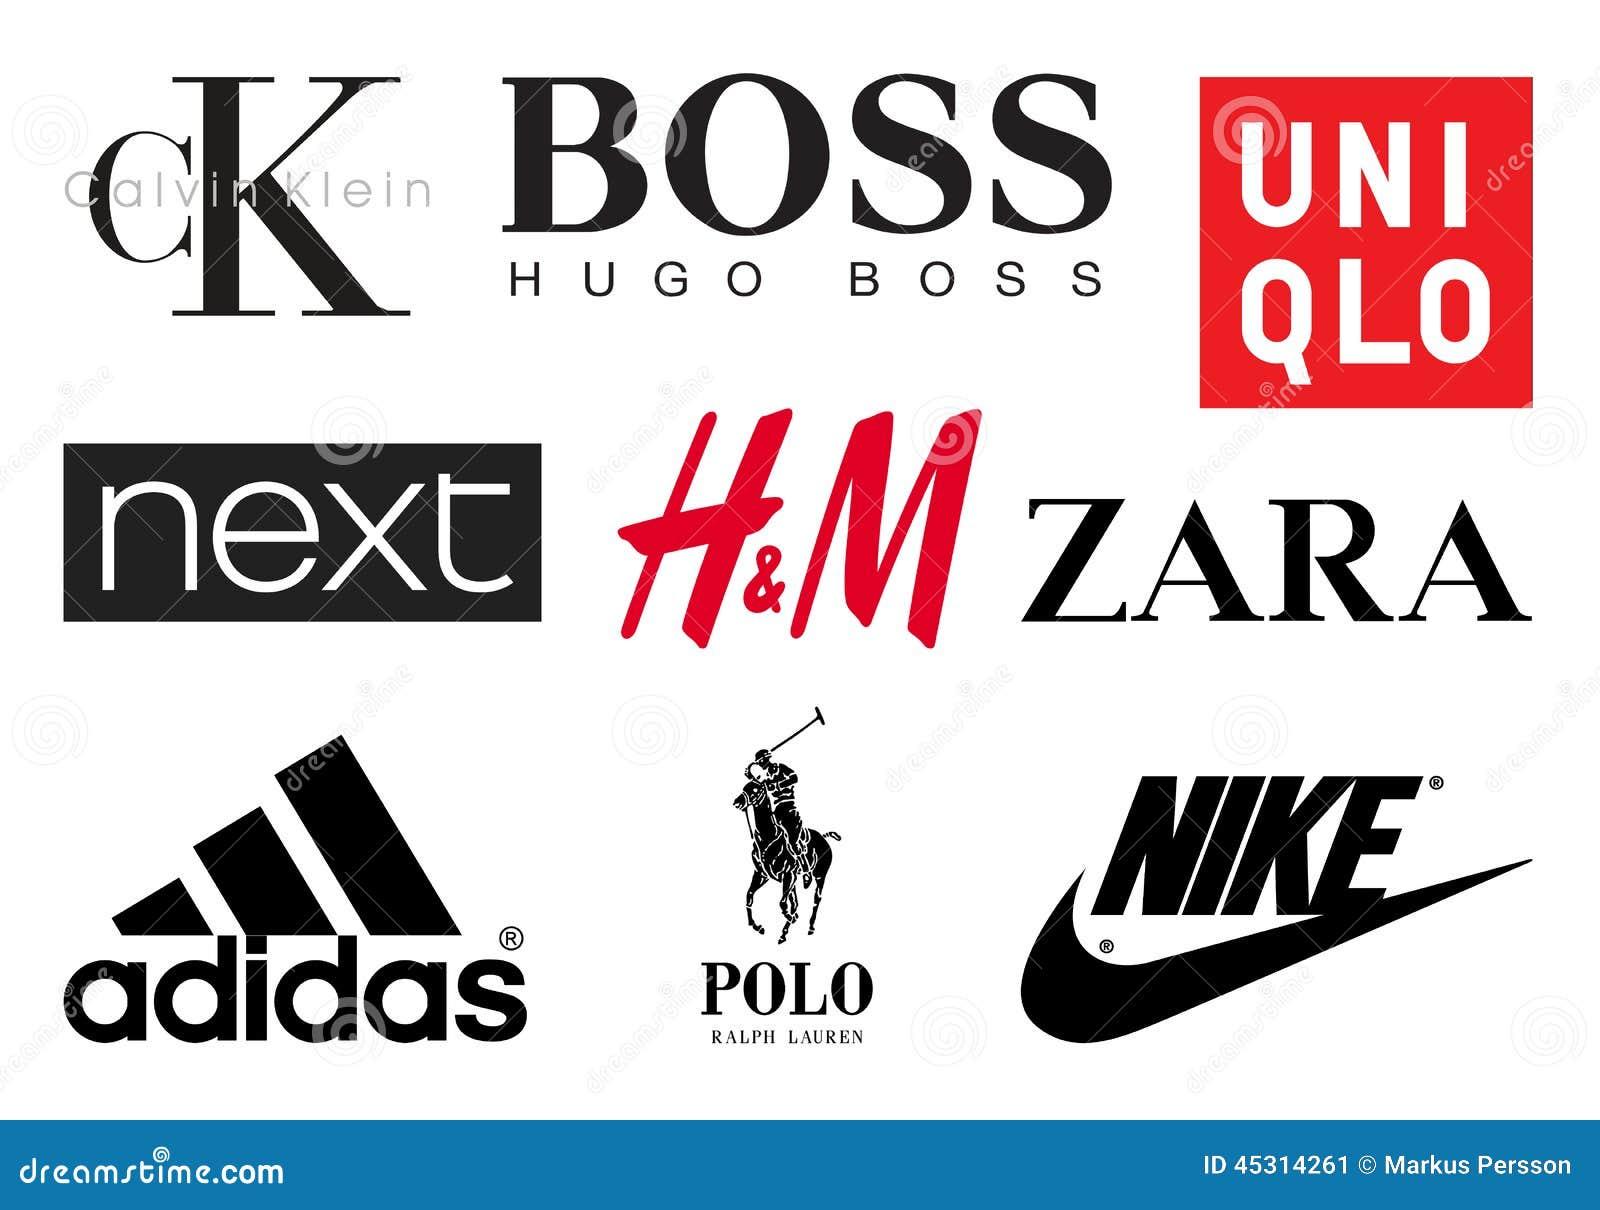 Ethical Shoe Shops